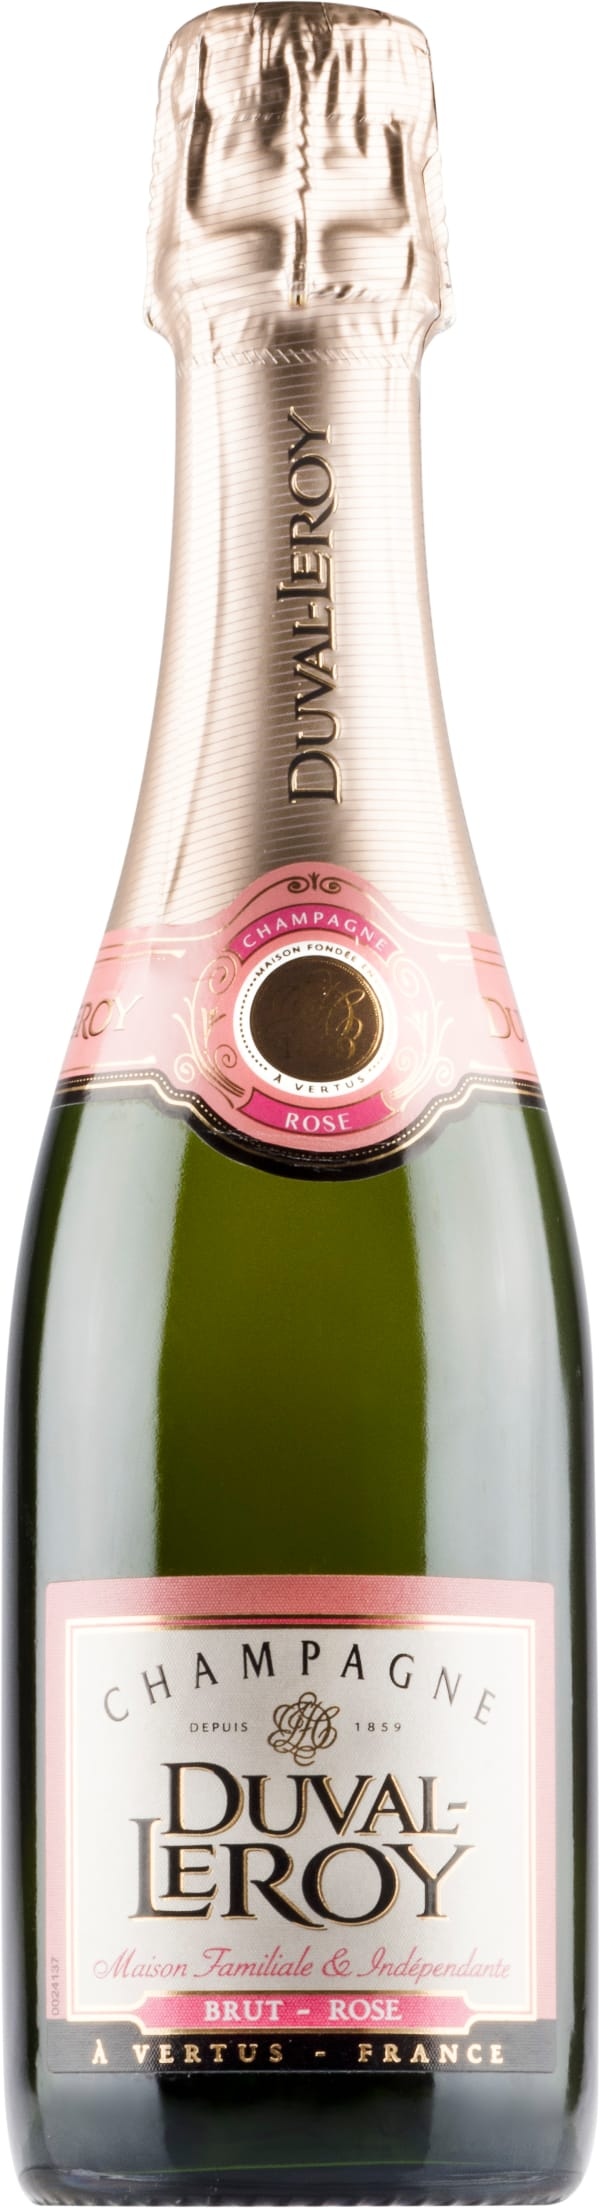 Duval-Leroy Rosé Champagne Brut